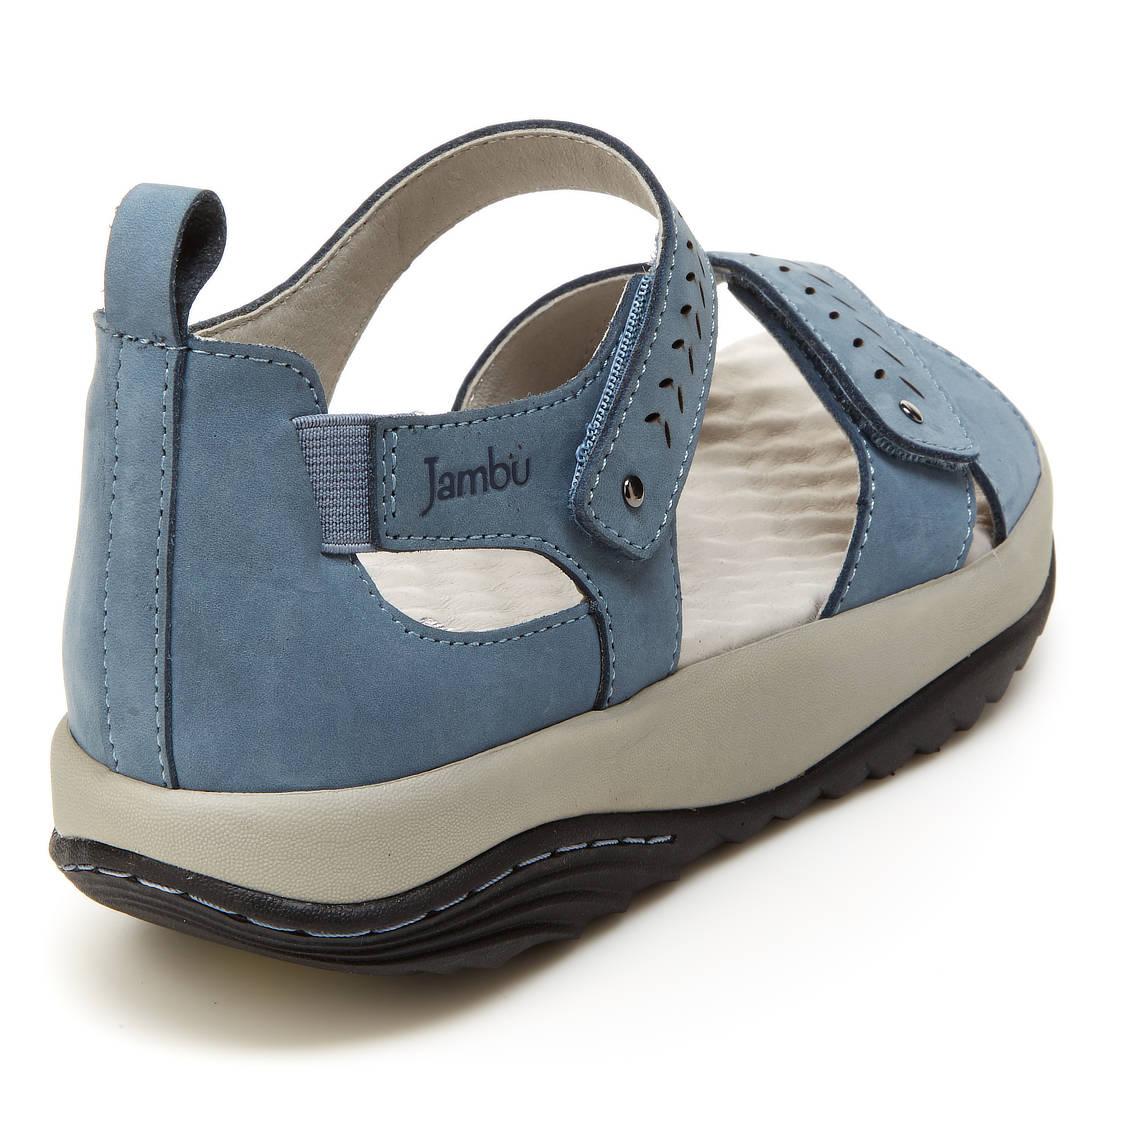 jambu-sedona-j1sed06-lt-blue-3